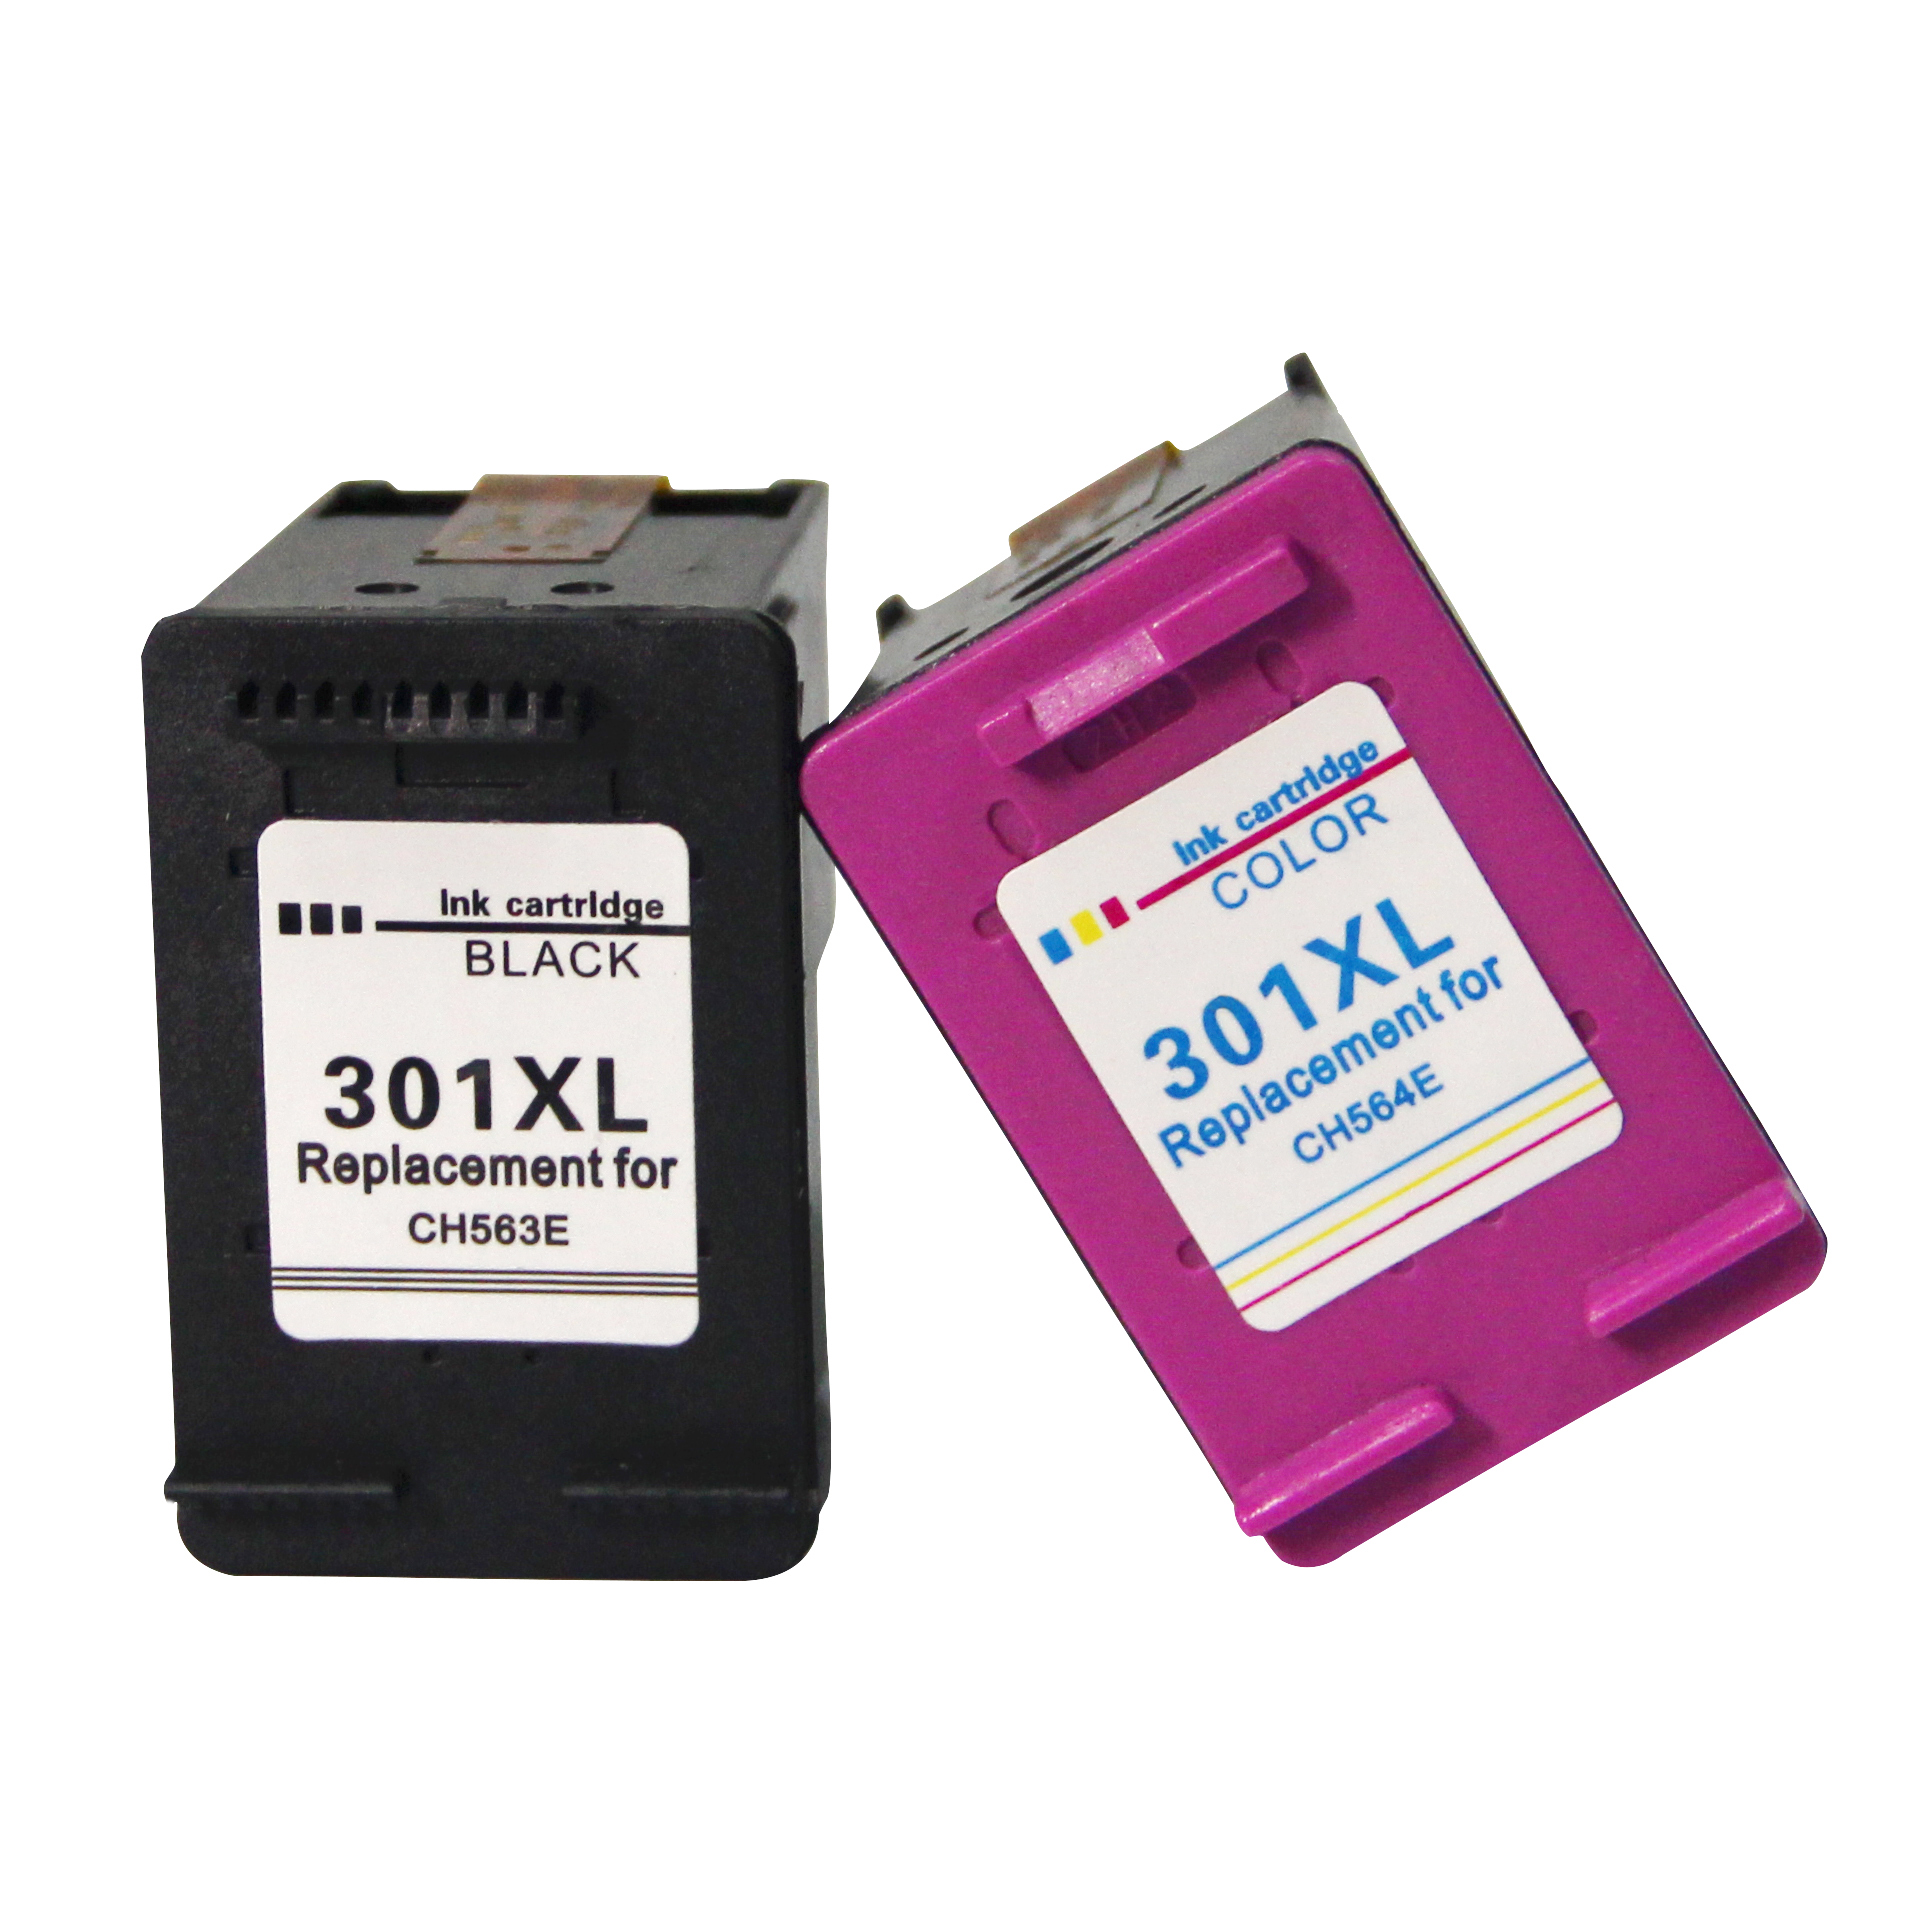 Cartucho de tinta compatible 301XL para HP 301 funciona en HP Deskjet 1000 1050 2000 2050 2050S 2510 3510 3050 3050a Impresoras